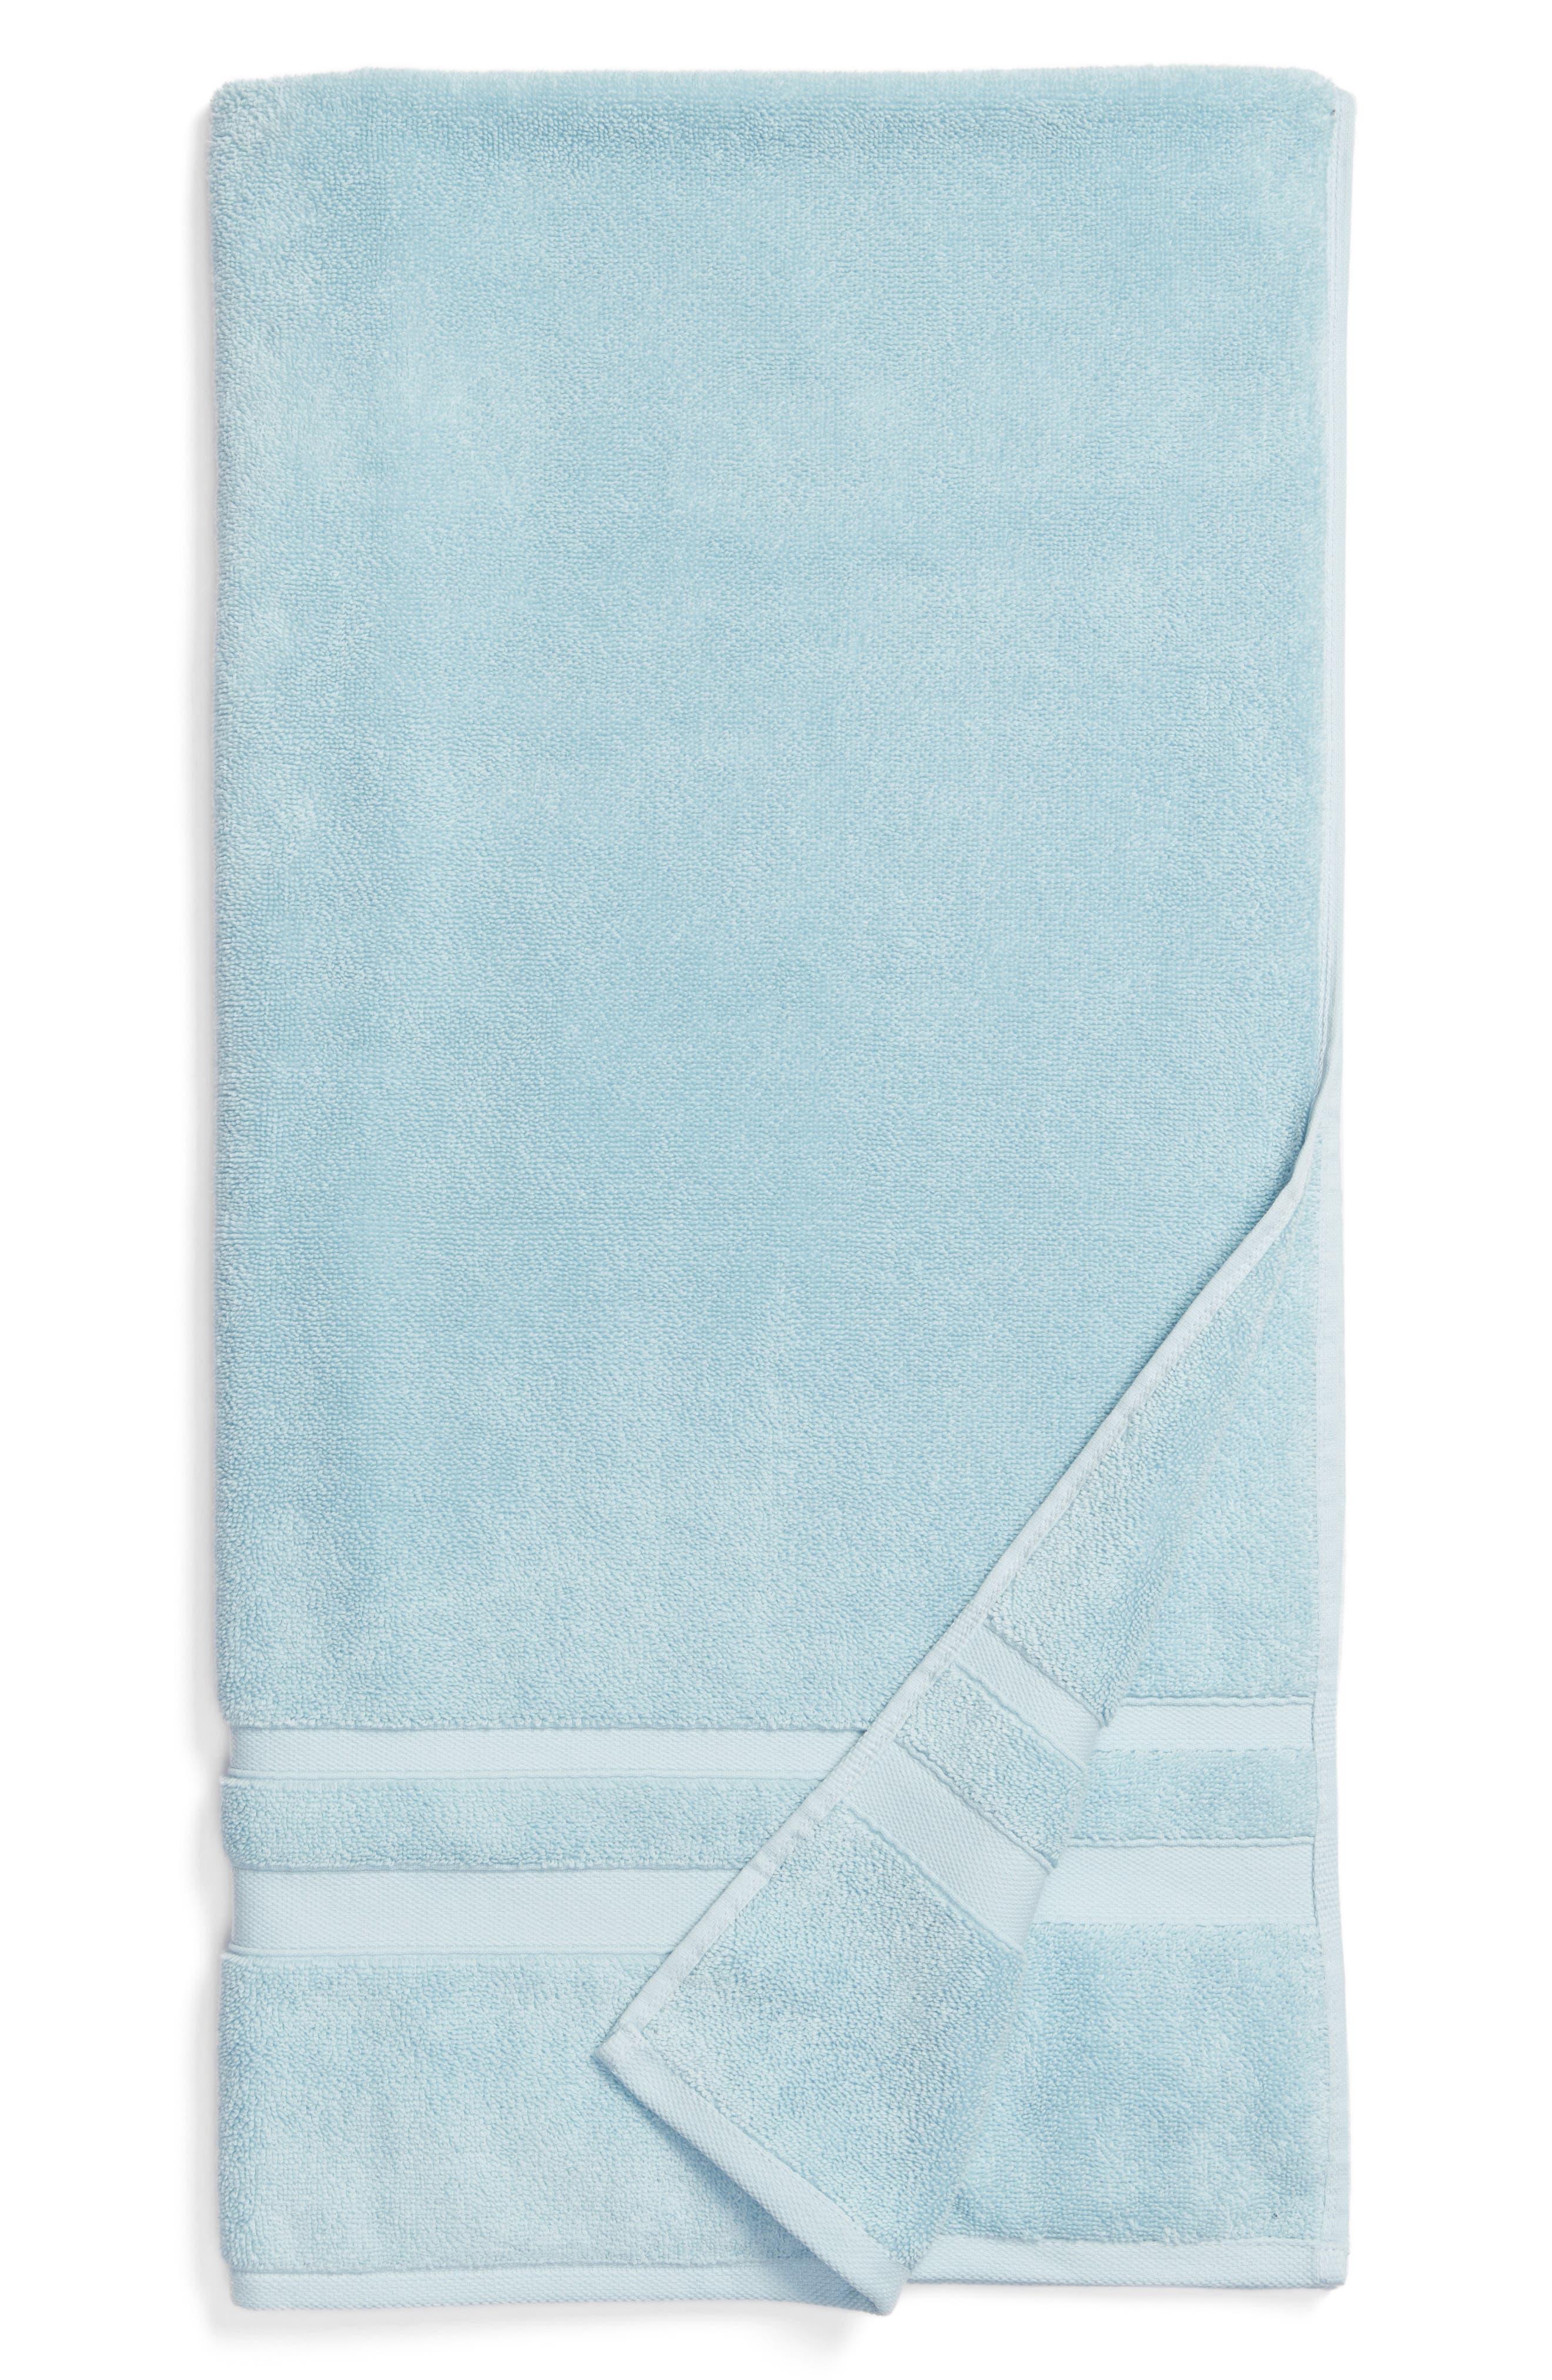 WATERWORKS STUDIO 'Perennial' Turkish Cotton Bath Towel, Main, color, CHRYSTAL BLUE